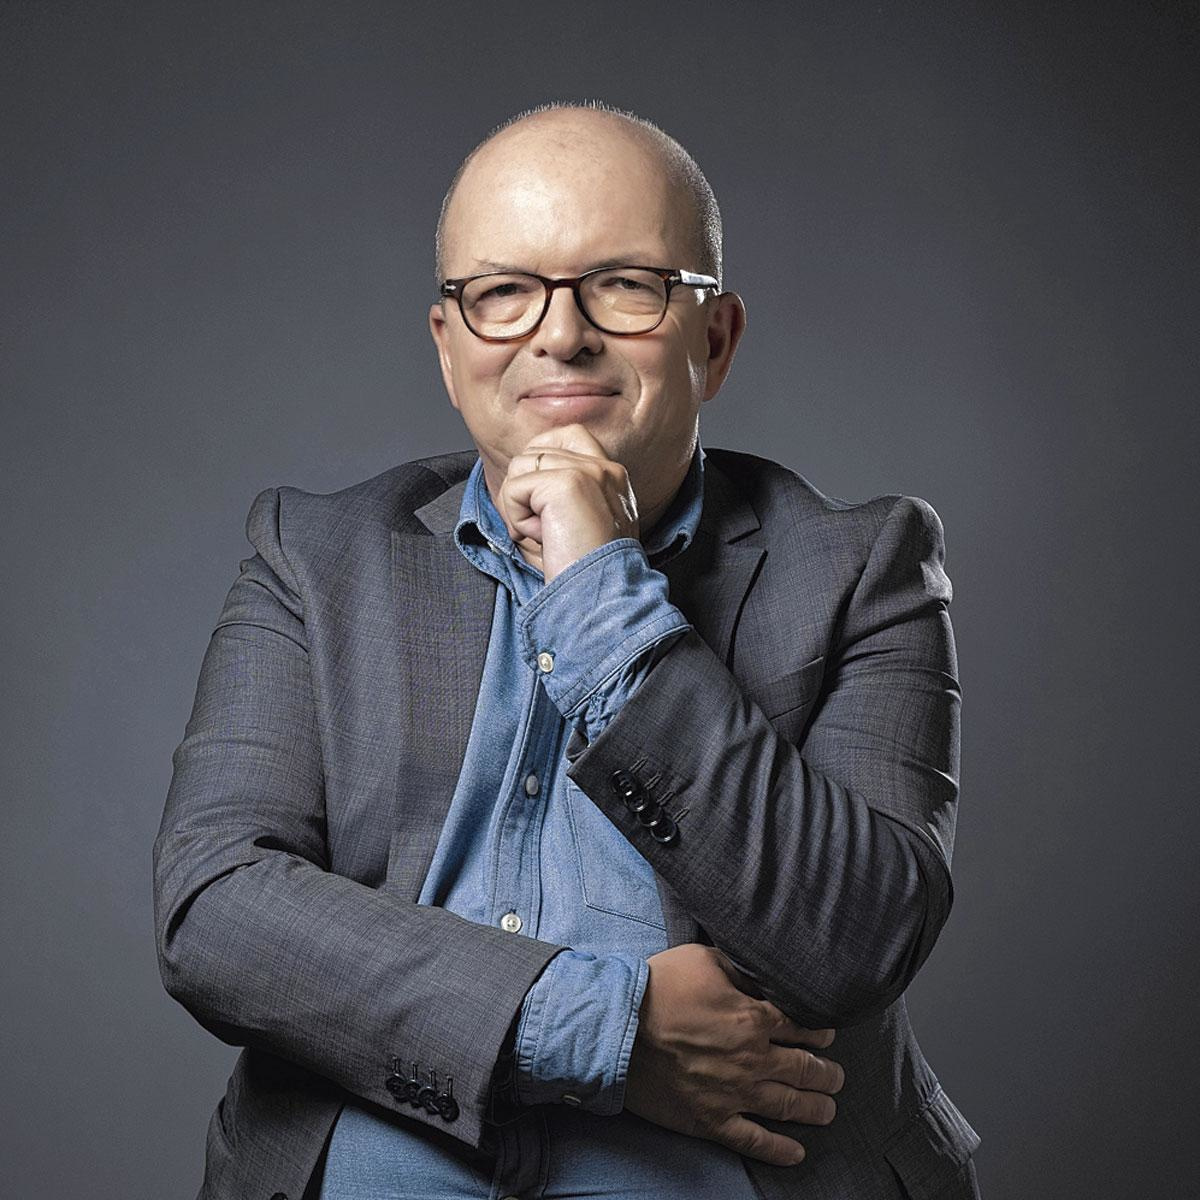 Stéphane Rosenblatt, RTL